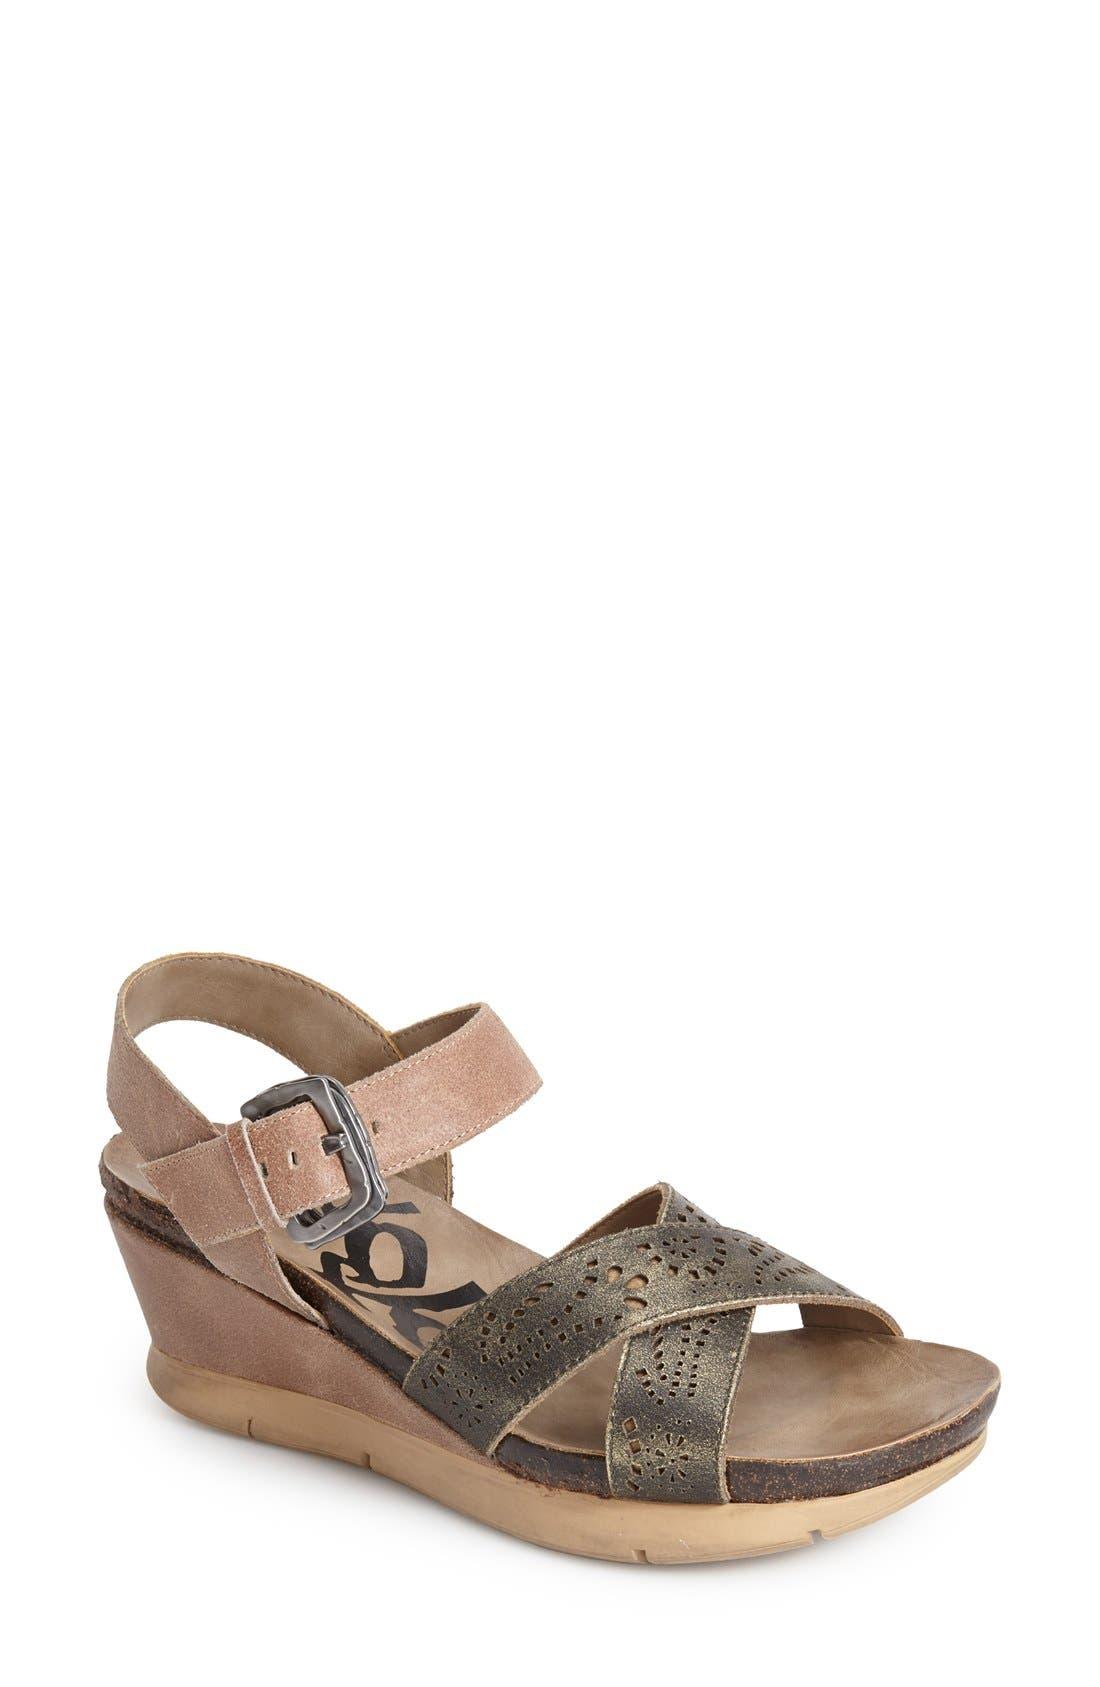 Main Image - OTBT 'Gearhart' Sandal